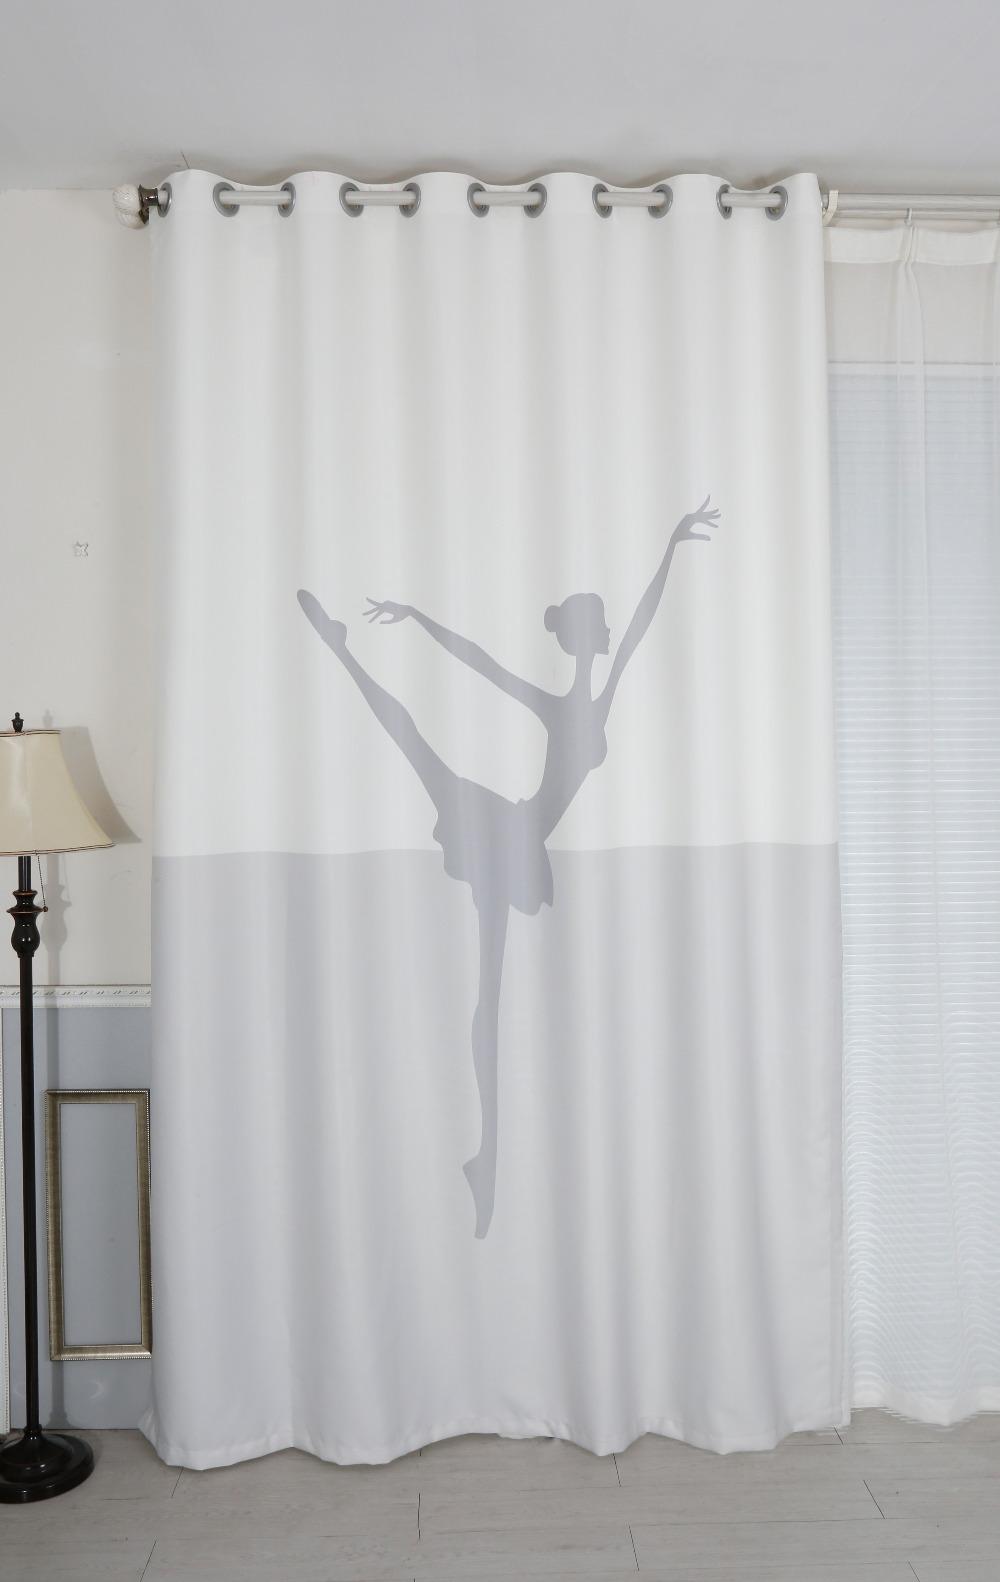 Senisaihon 3d Blackout Curtains Cartoon White Ballet Woman Pattern